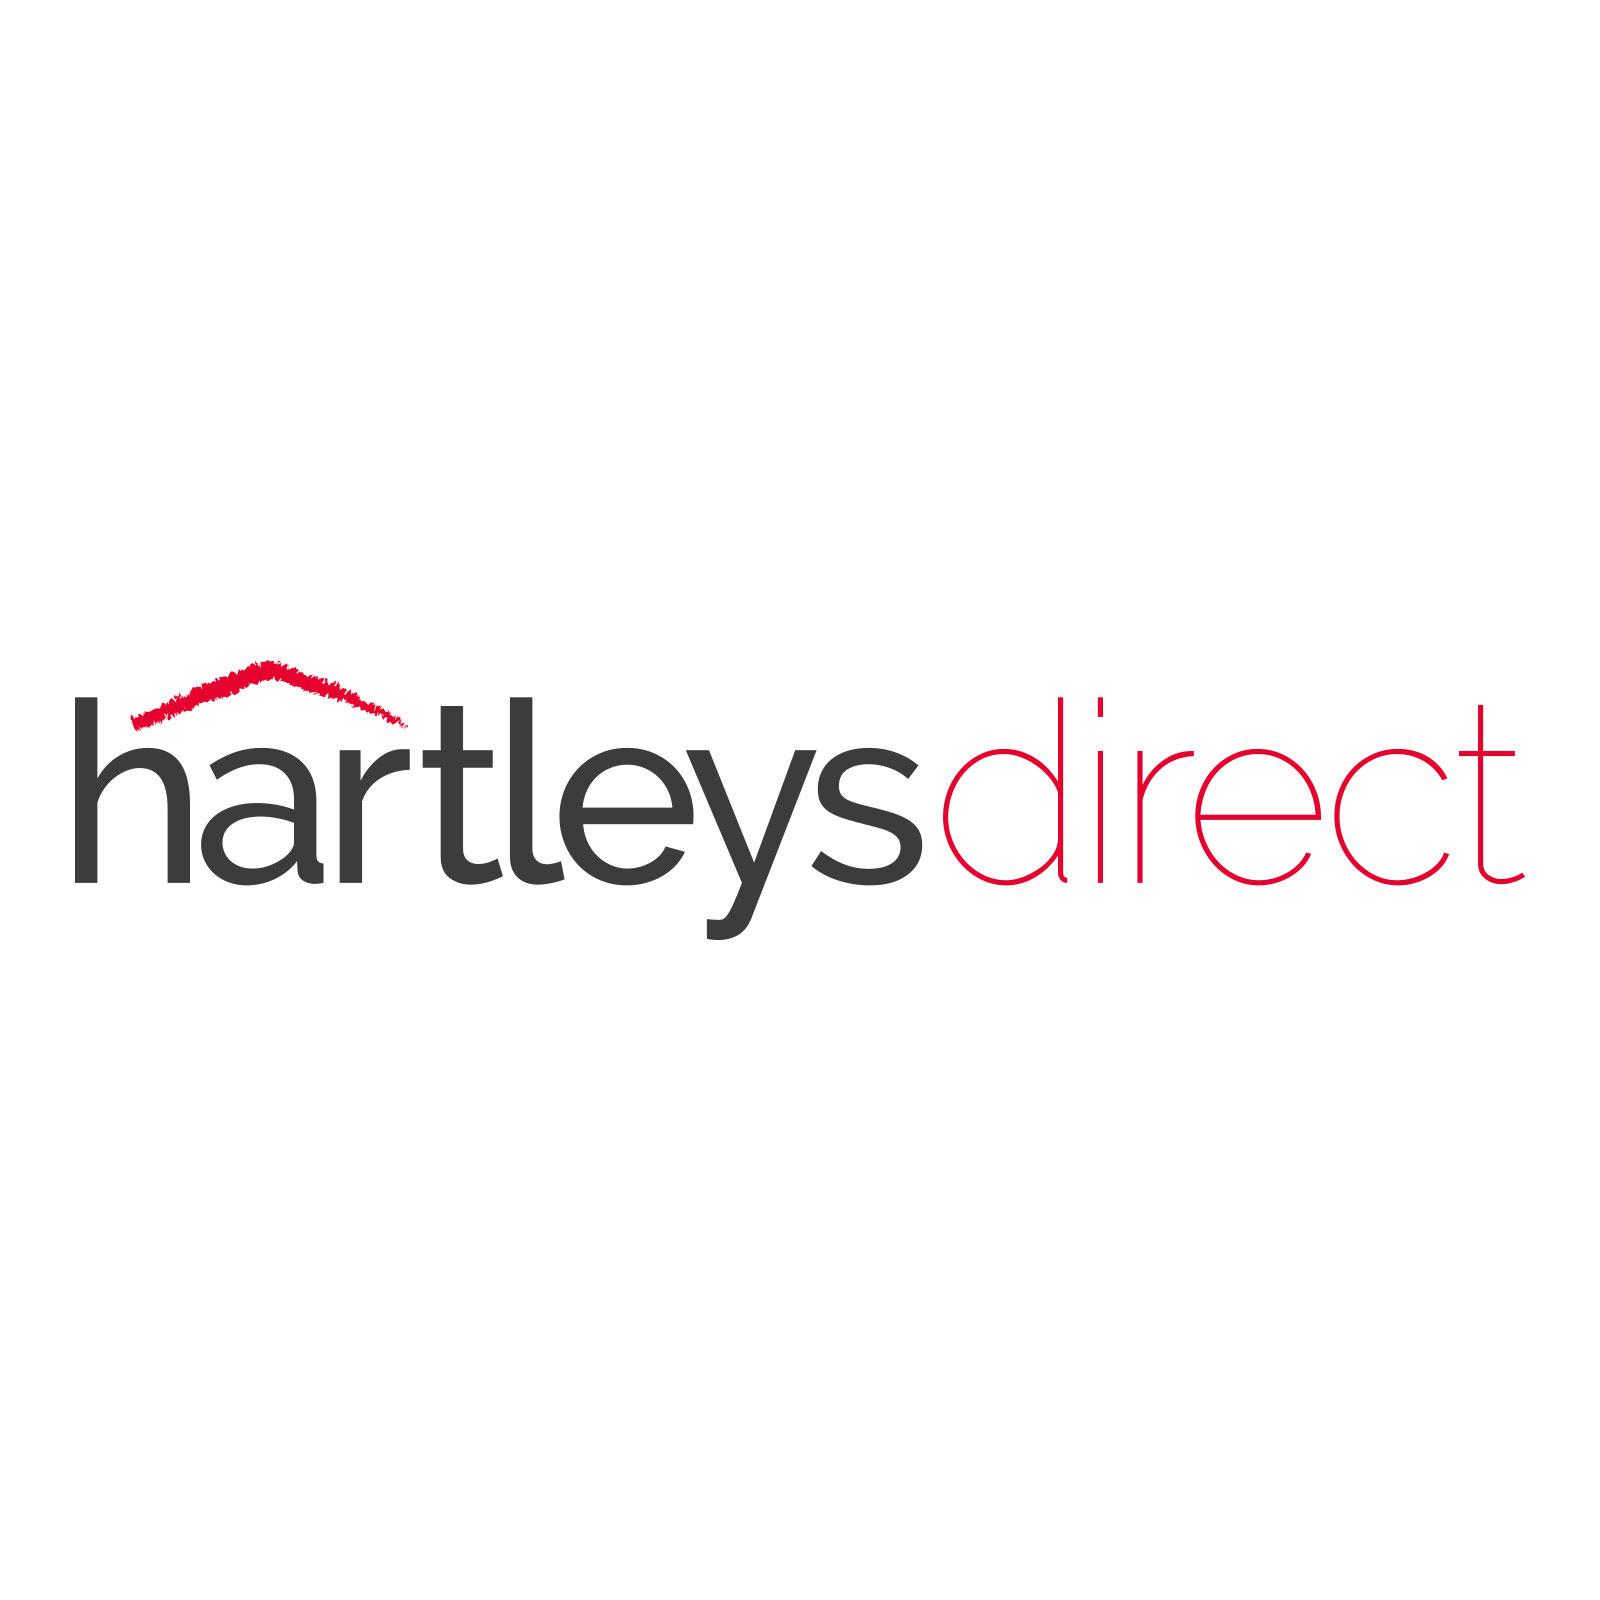 Hartleys-Grey-Rectangular-Fabric-Storage-Box-with-Metal-Ring-Handle-on-White-Background.jpg